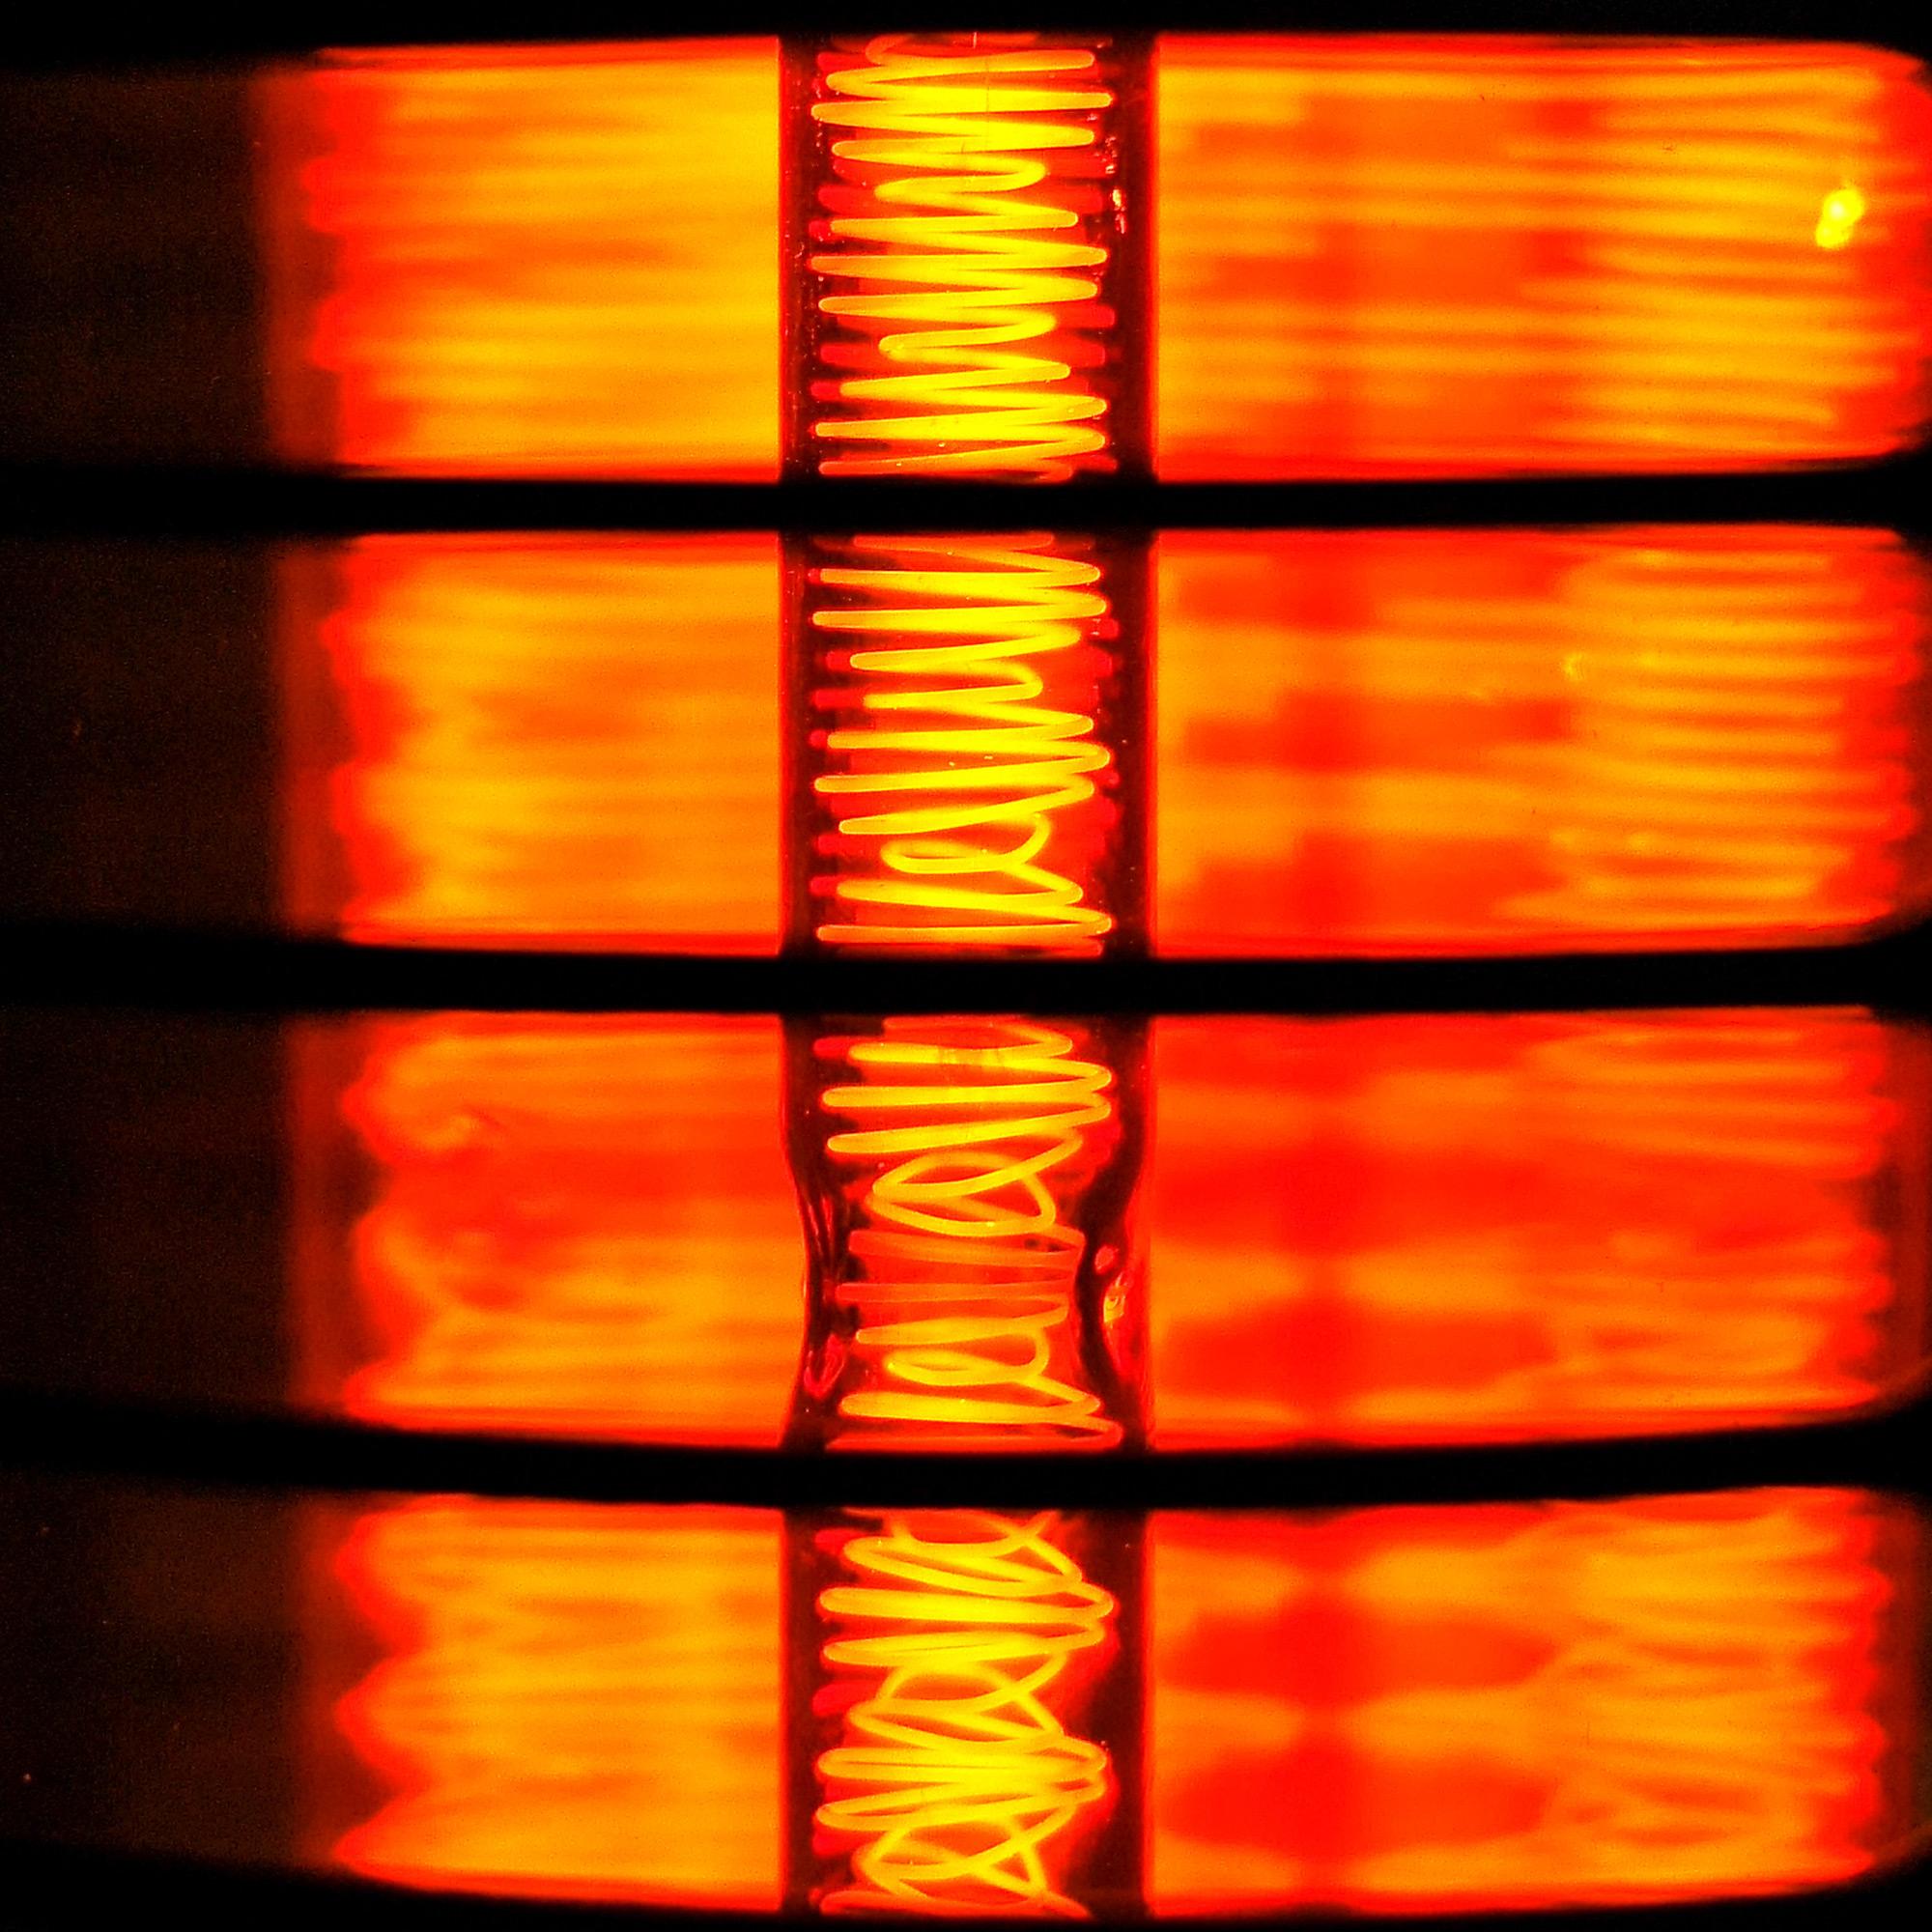 Ultra-Star-Low-Glare-tube-85%-less-light-HeatTower-Mini-portable-heater